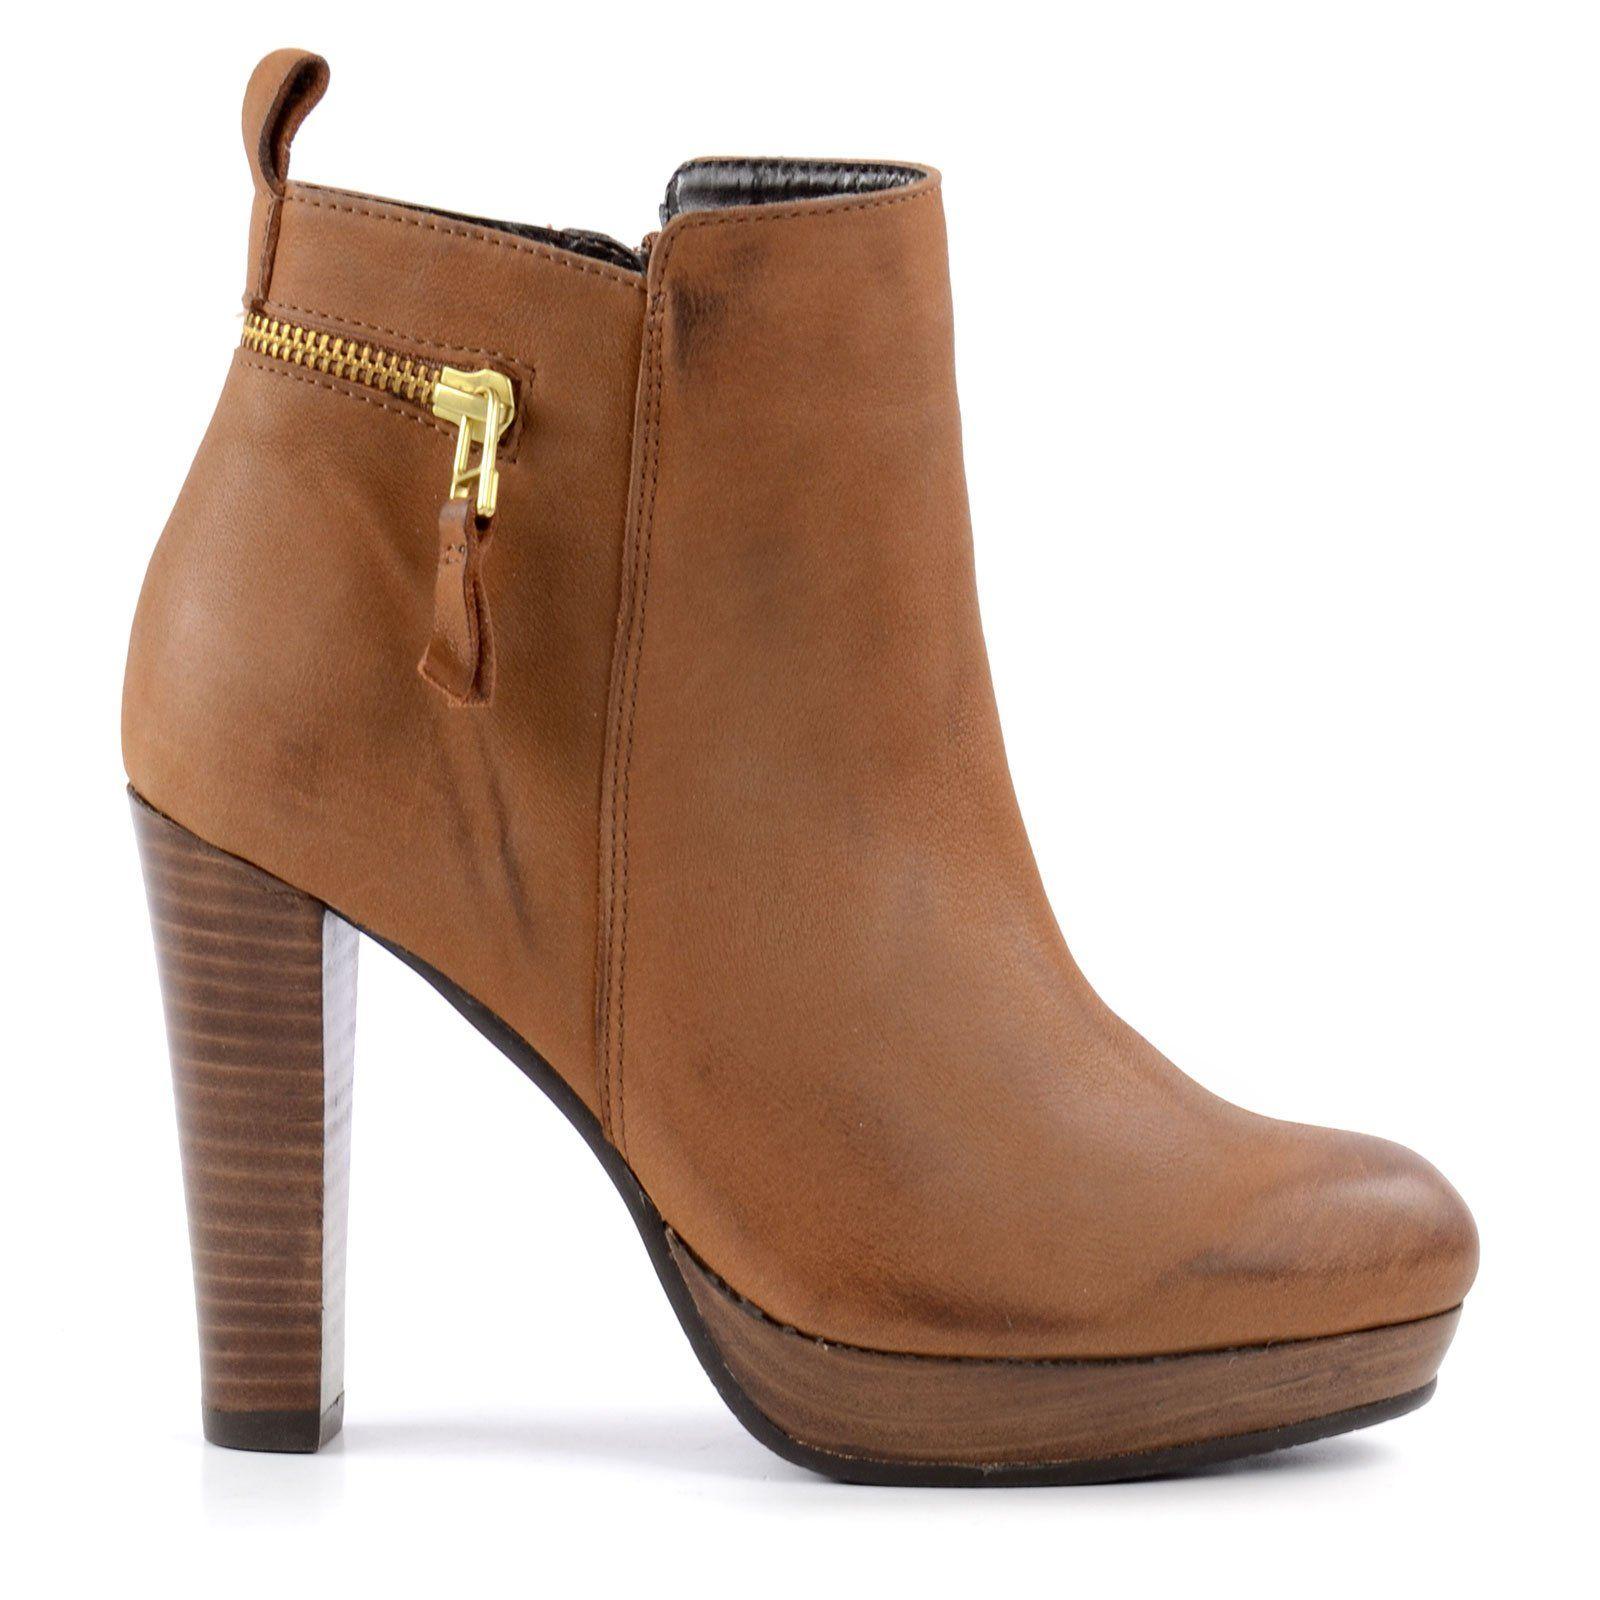 SACHA Hohe Stiefeletten braun | shoes | Schuhe, Schuh